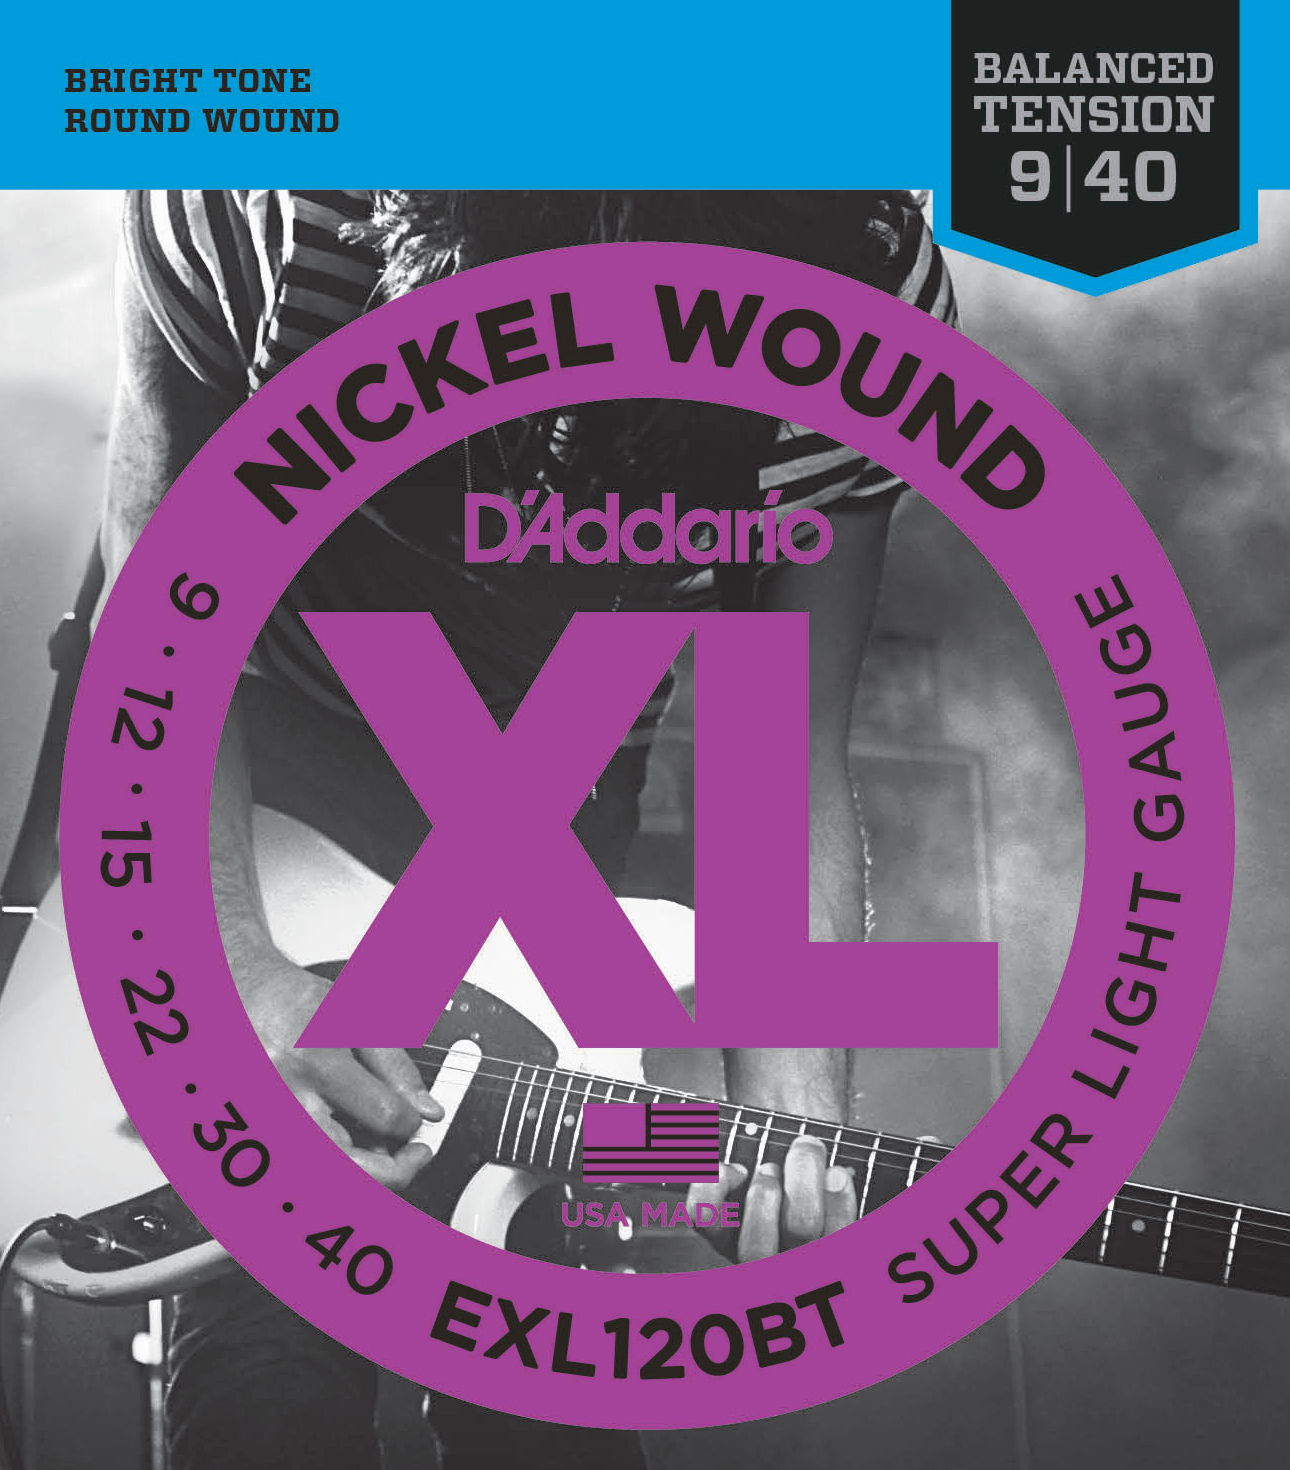 D'Addario EXL120BT Balanced Tension Electric Stringset